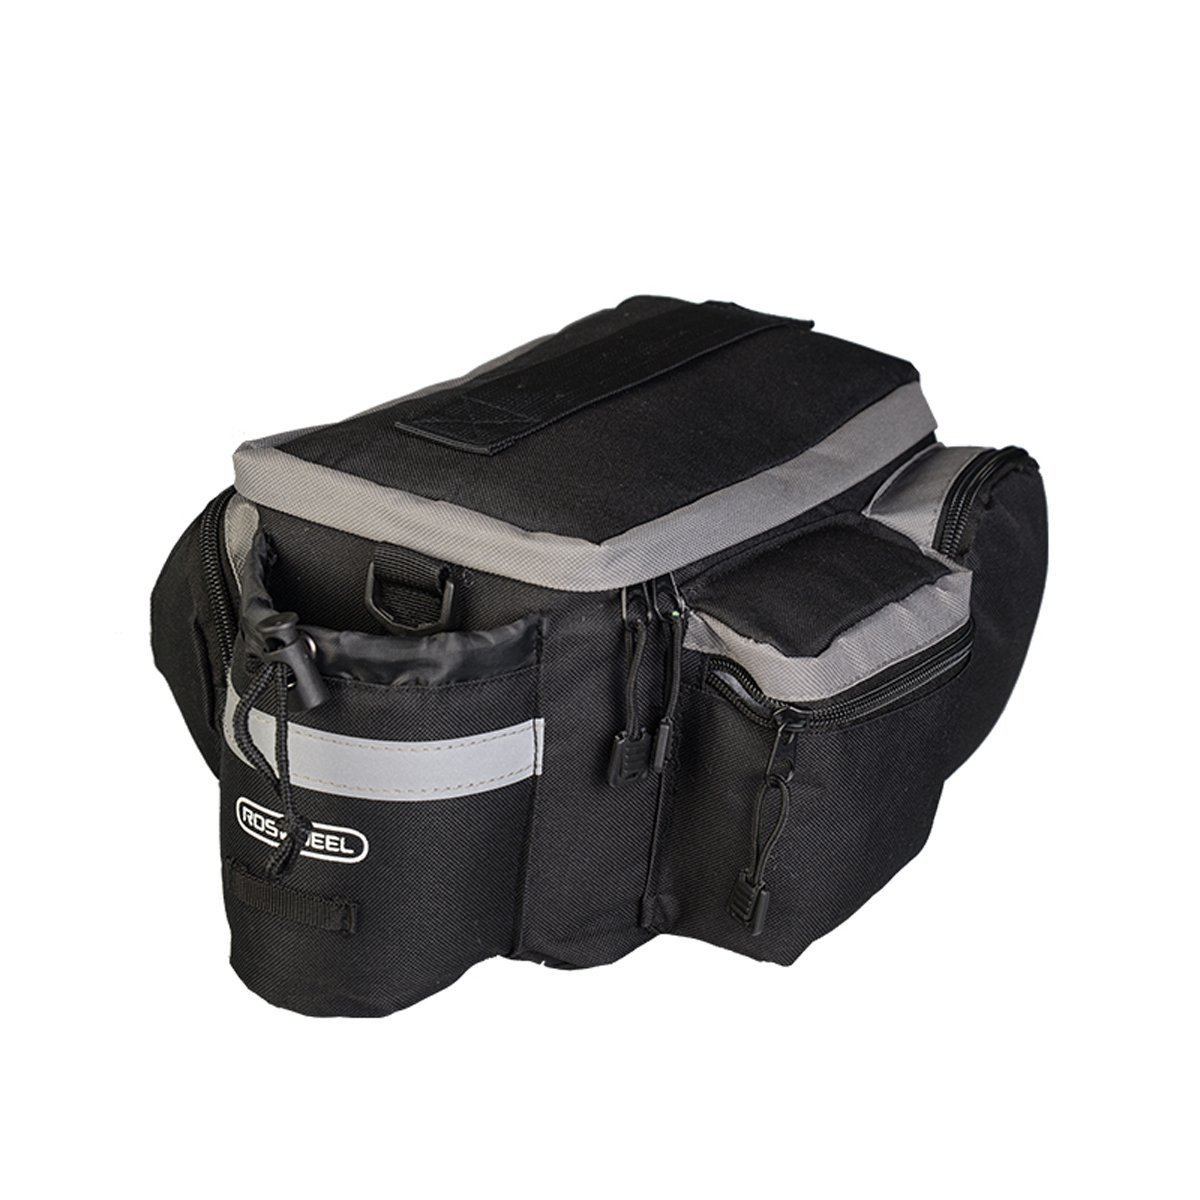 TraderPlus Bike Pannier Bag - Durable & Waterproof Nylon with Reflector Handbag | Shoulder Strap Rack Rear Trunk Tote Bag | Strong Velcro, Zipper Pockets & Bottle Case by TRADERPLUS (Image #4)